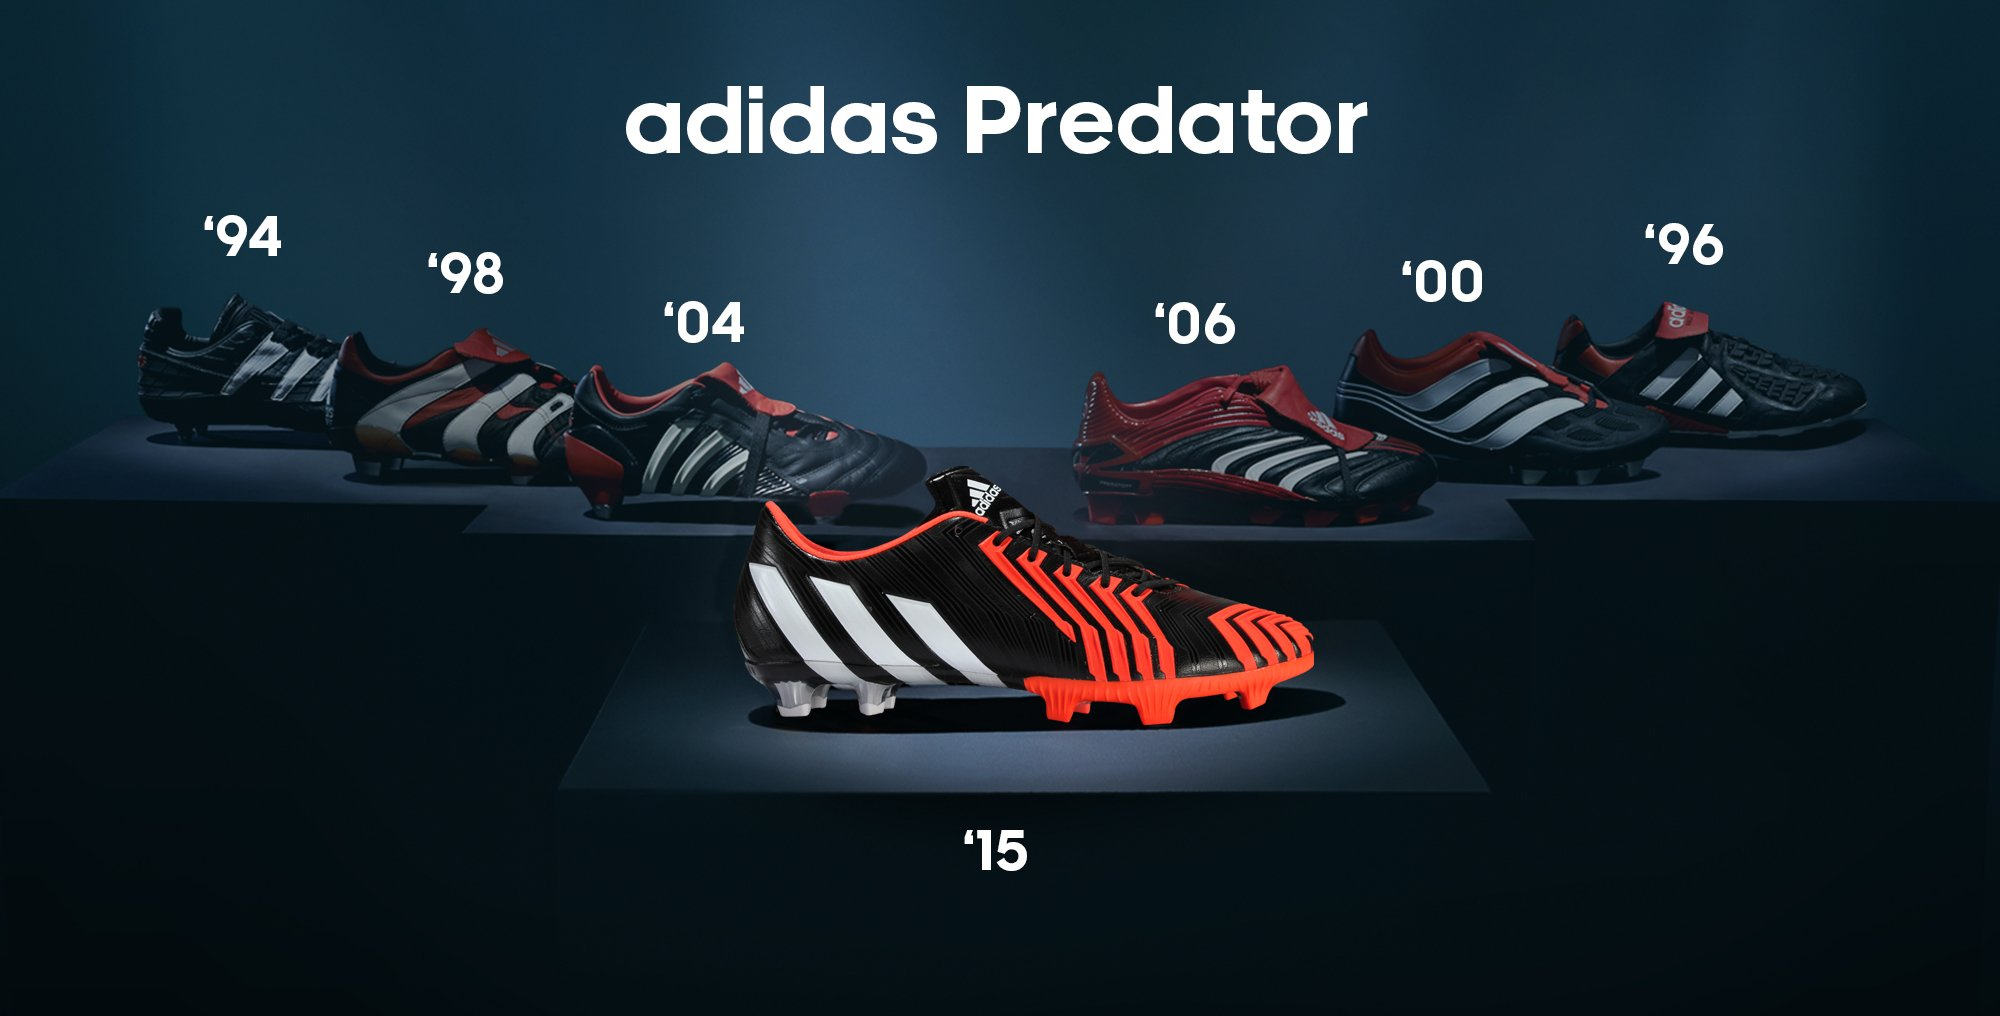 revendeur d5741 eeea7 adidas Predators | History Of The adidas Predator | Lovell ...